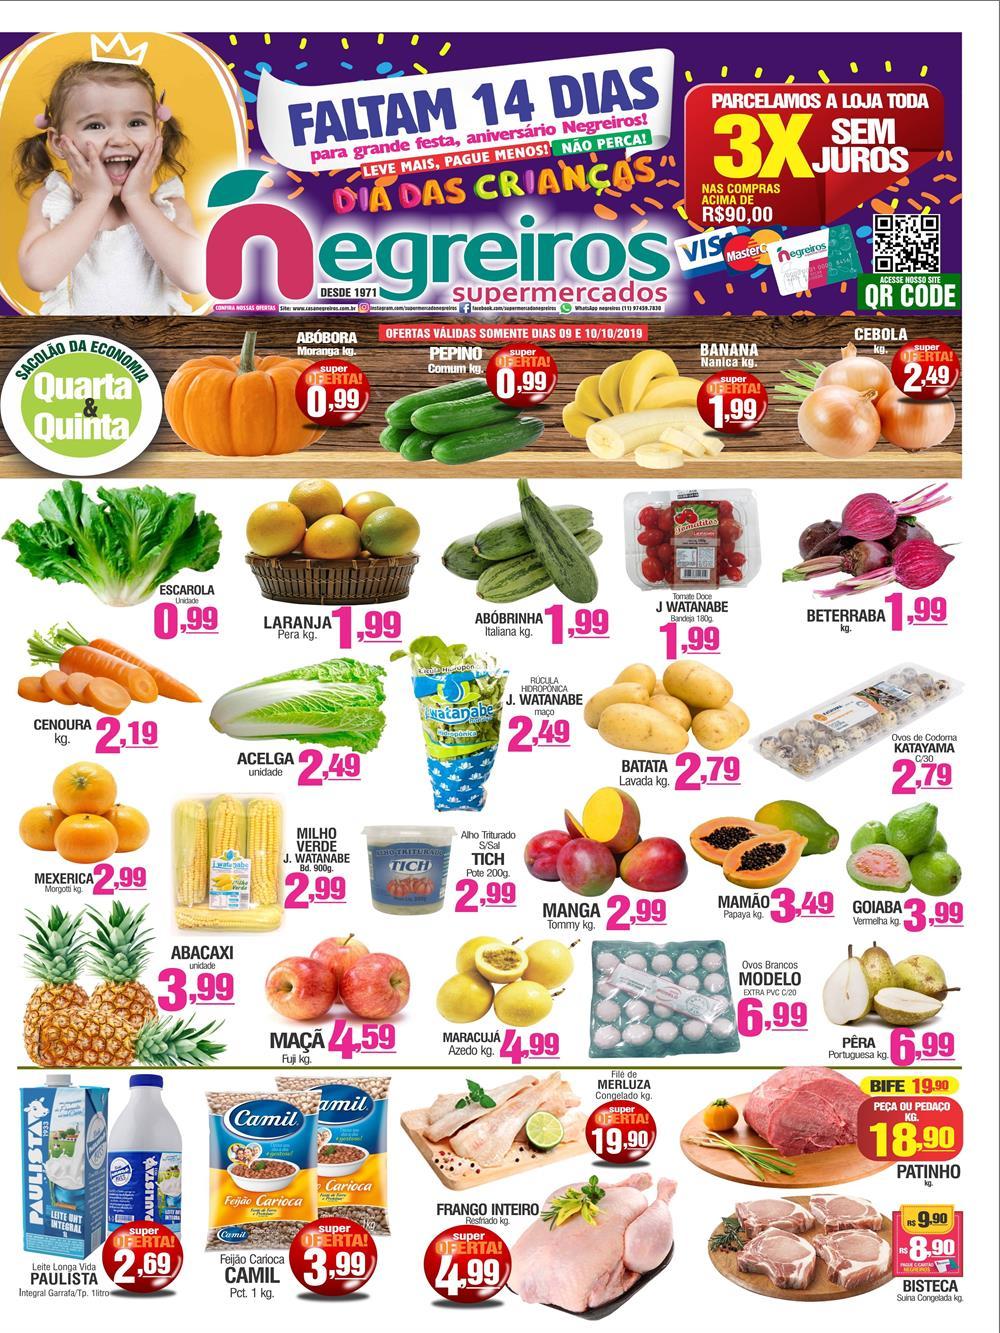 Negreiros-Ofertas-Tabloide1 Ofertas de supermercados - Black Friday 2019